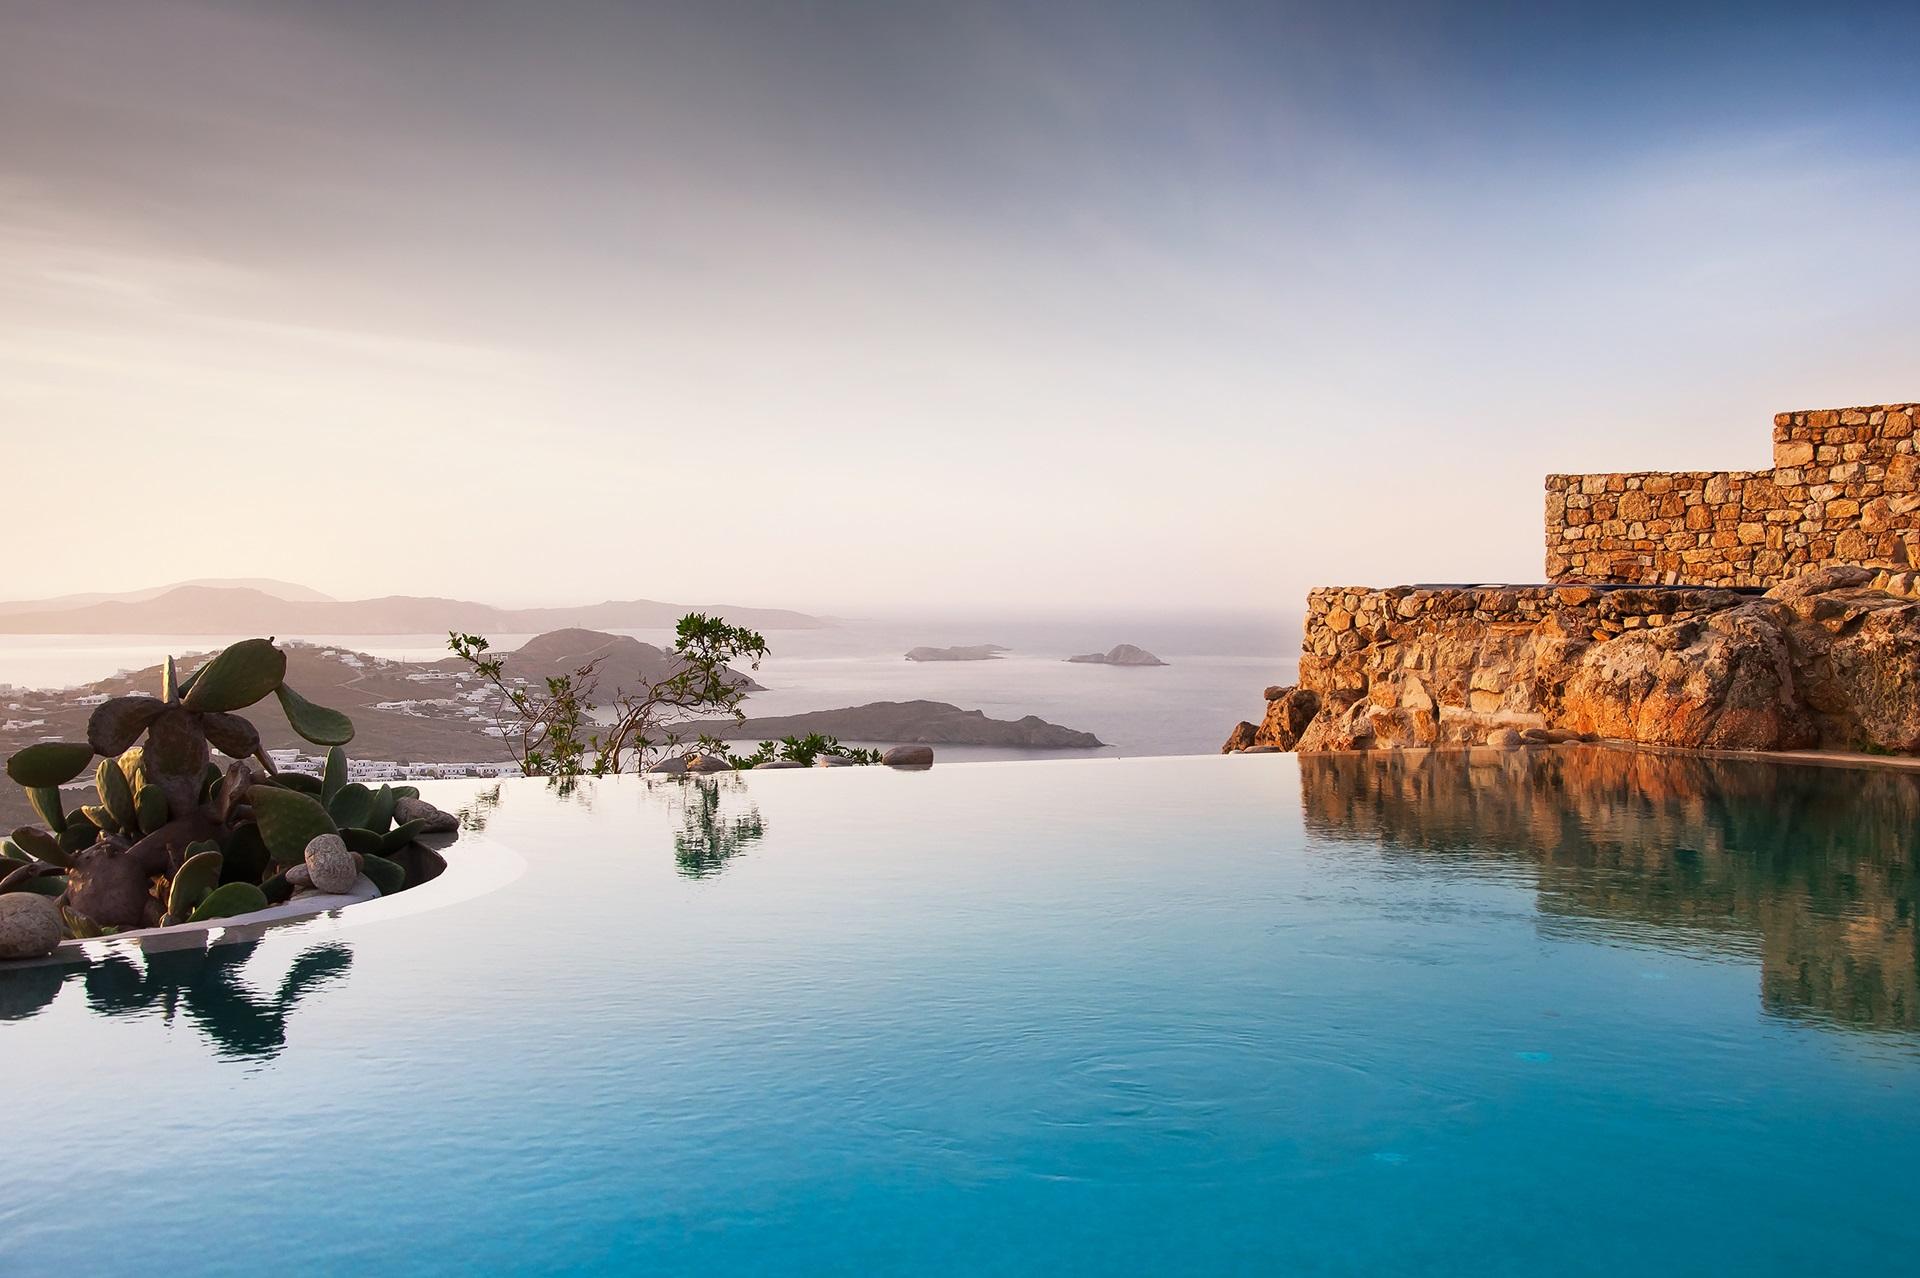 5 Villas, perfect for a group getaway in Mykonos!